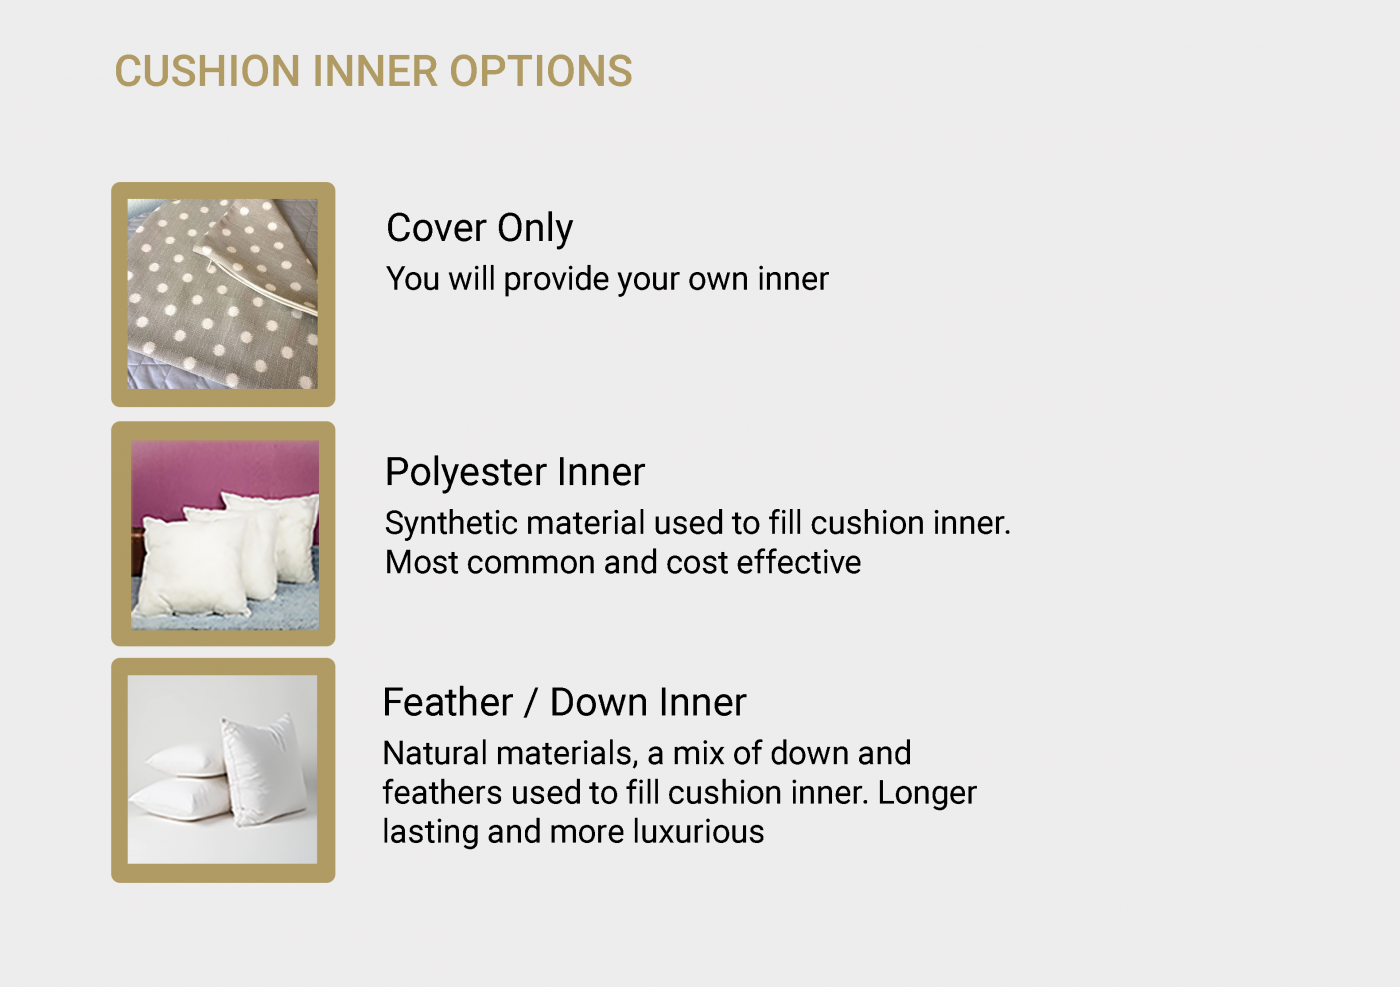 Zing Ecru Cushion Covers Nz Stunning Cushions Online Nz